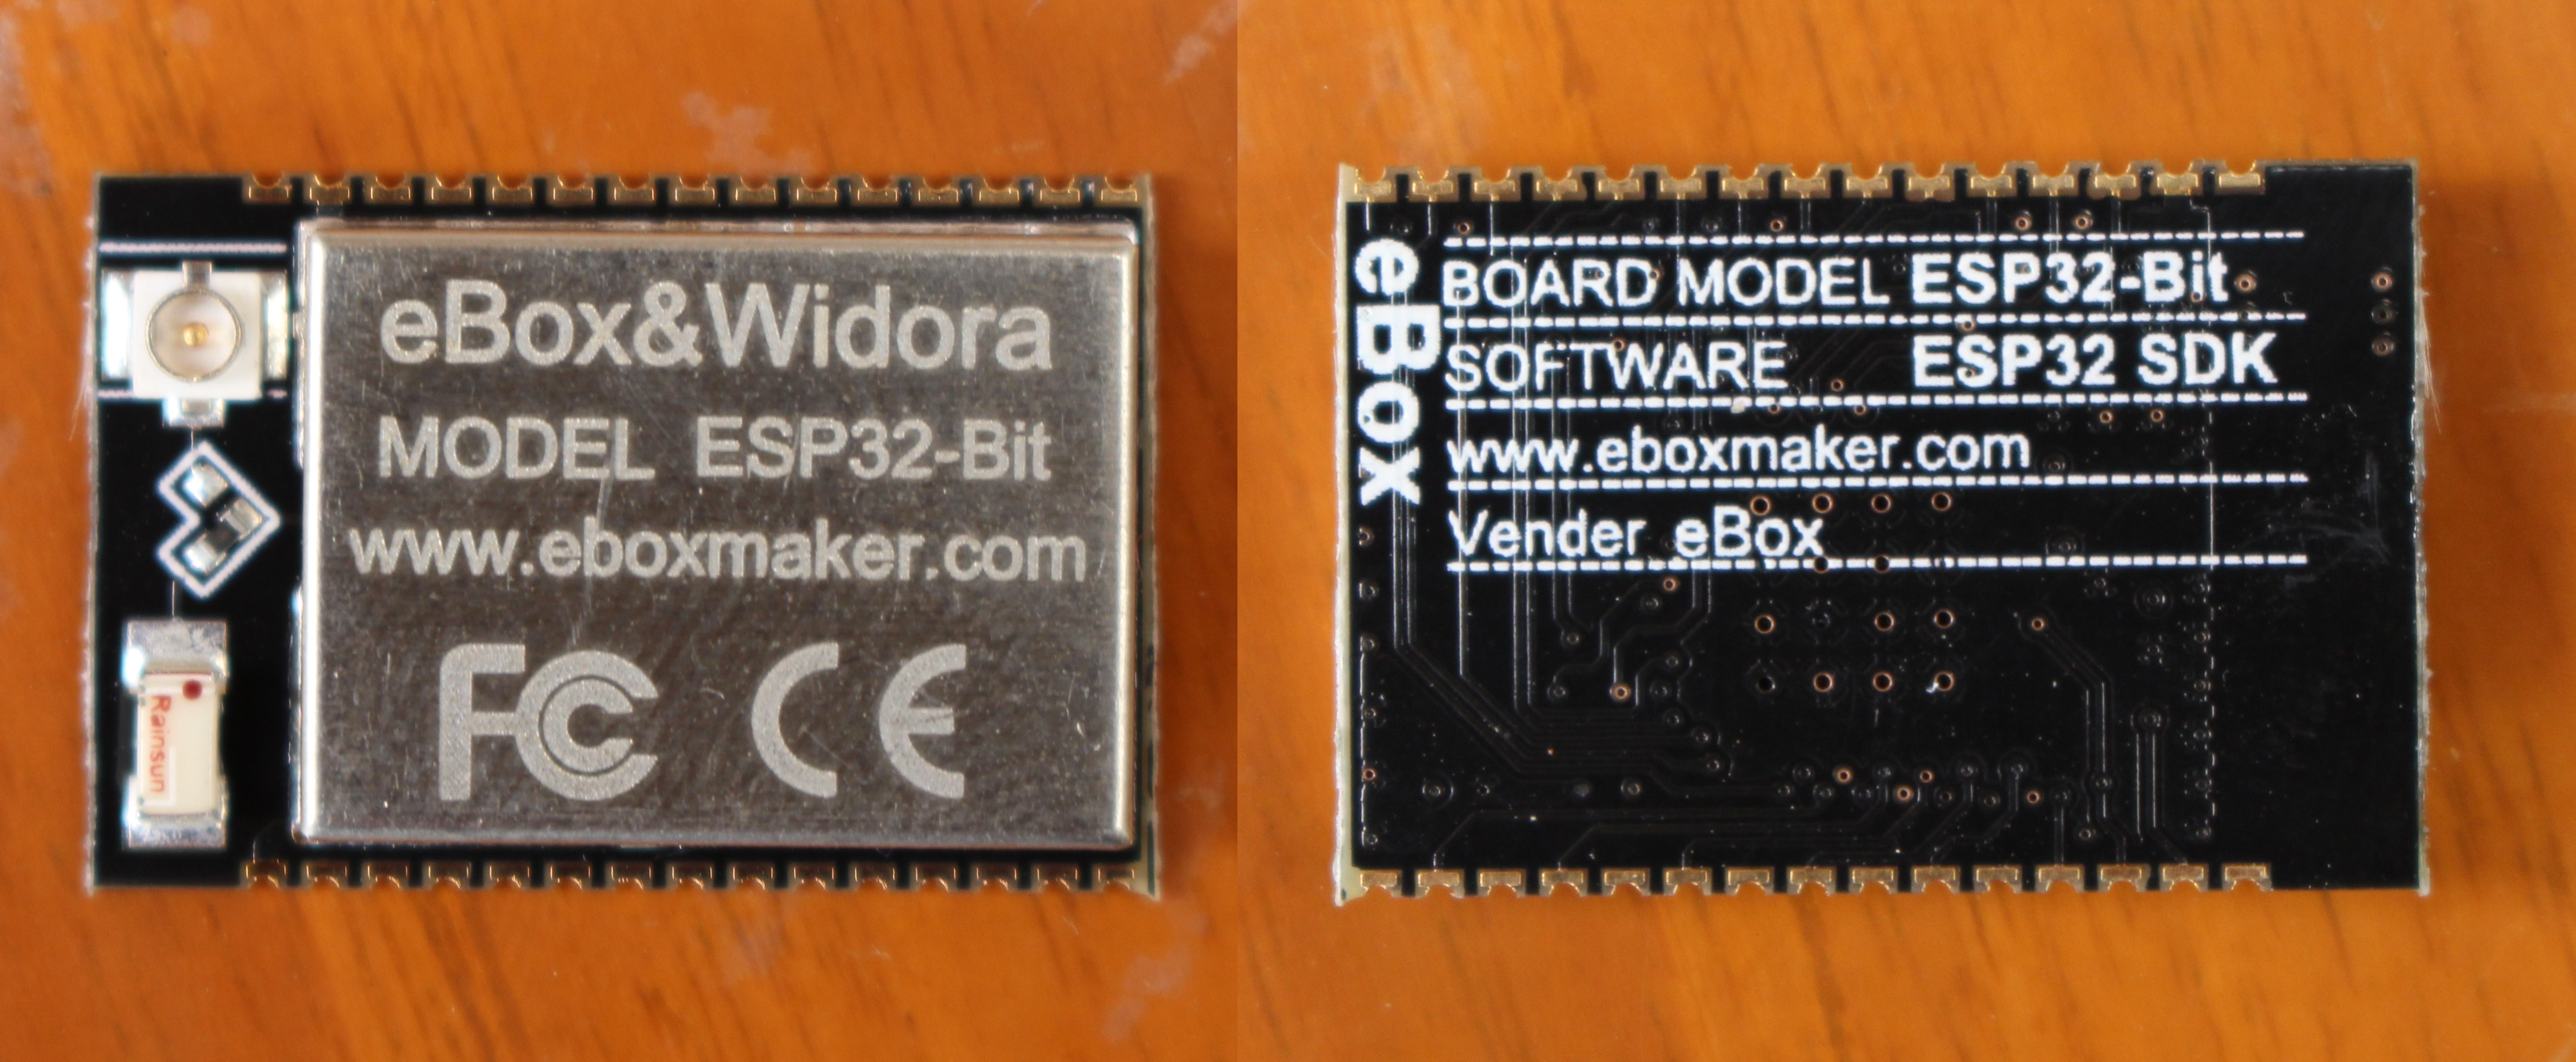 Getting Started with ESP32-Bit Module and ESP32-T Development Board